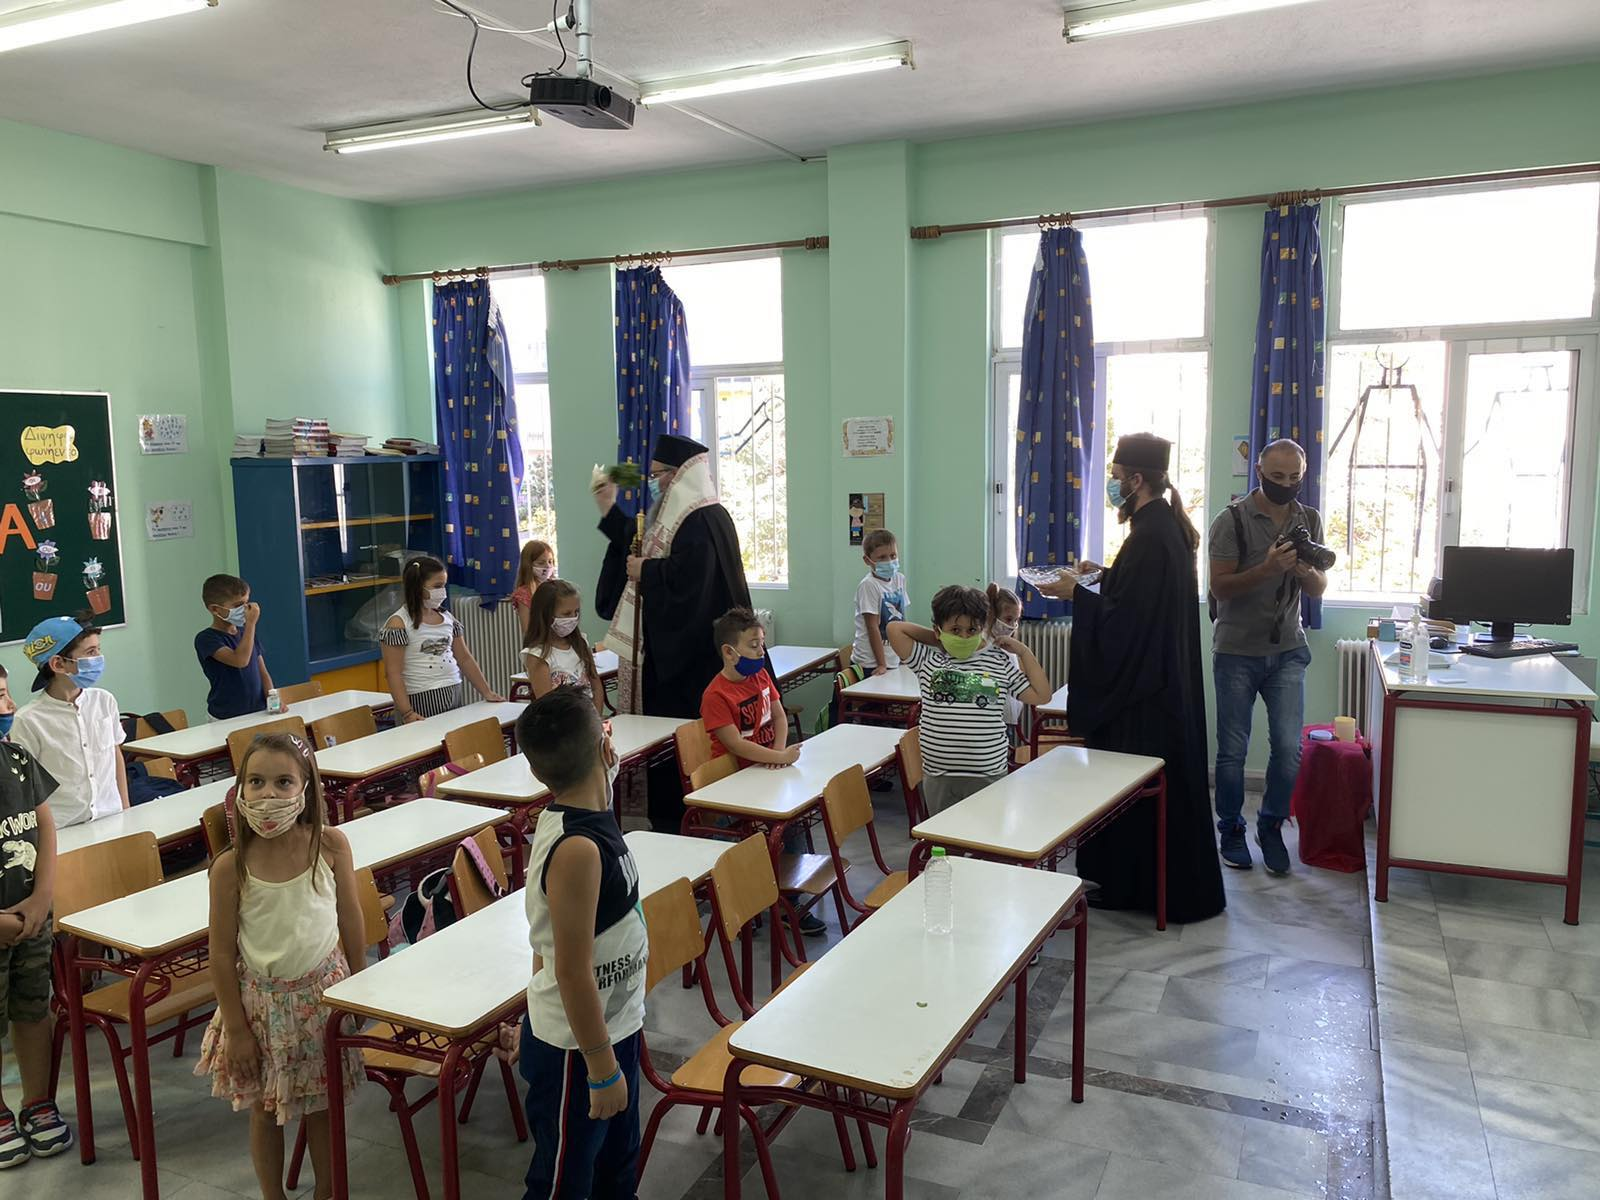 Agiasmoi 2020 7 - Αγιασμούς σε Σχολικές Μονάδες τέλεσε ο Σεβασμιώτατος